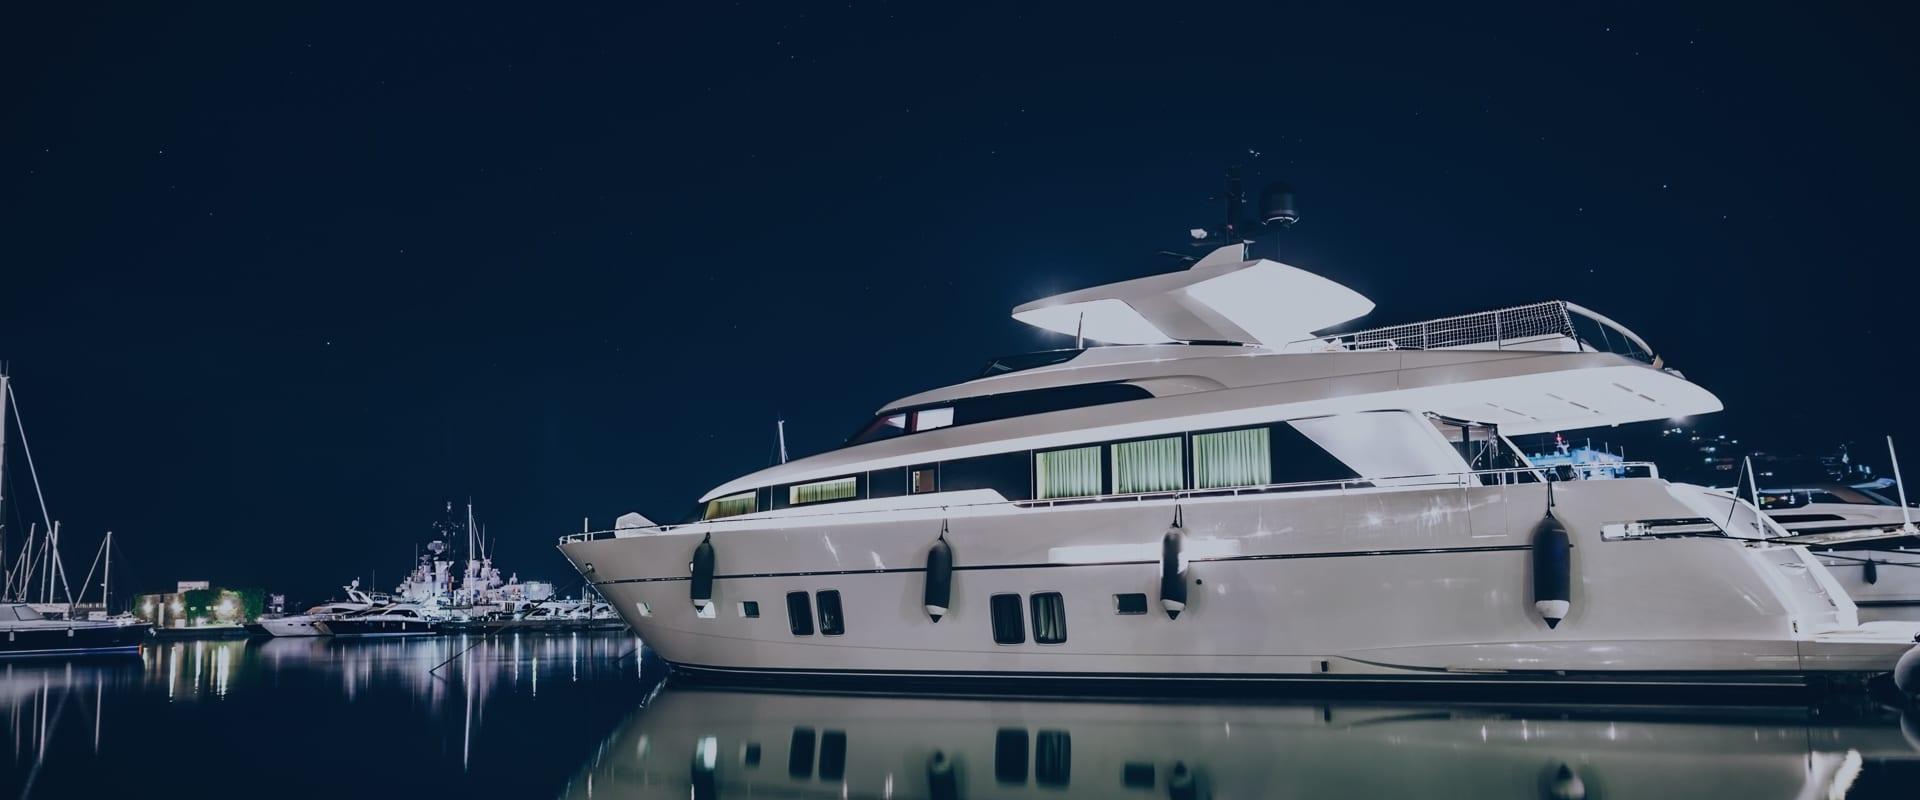 Yacht-at-Night-2